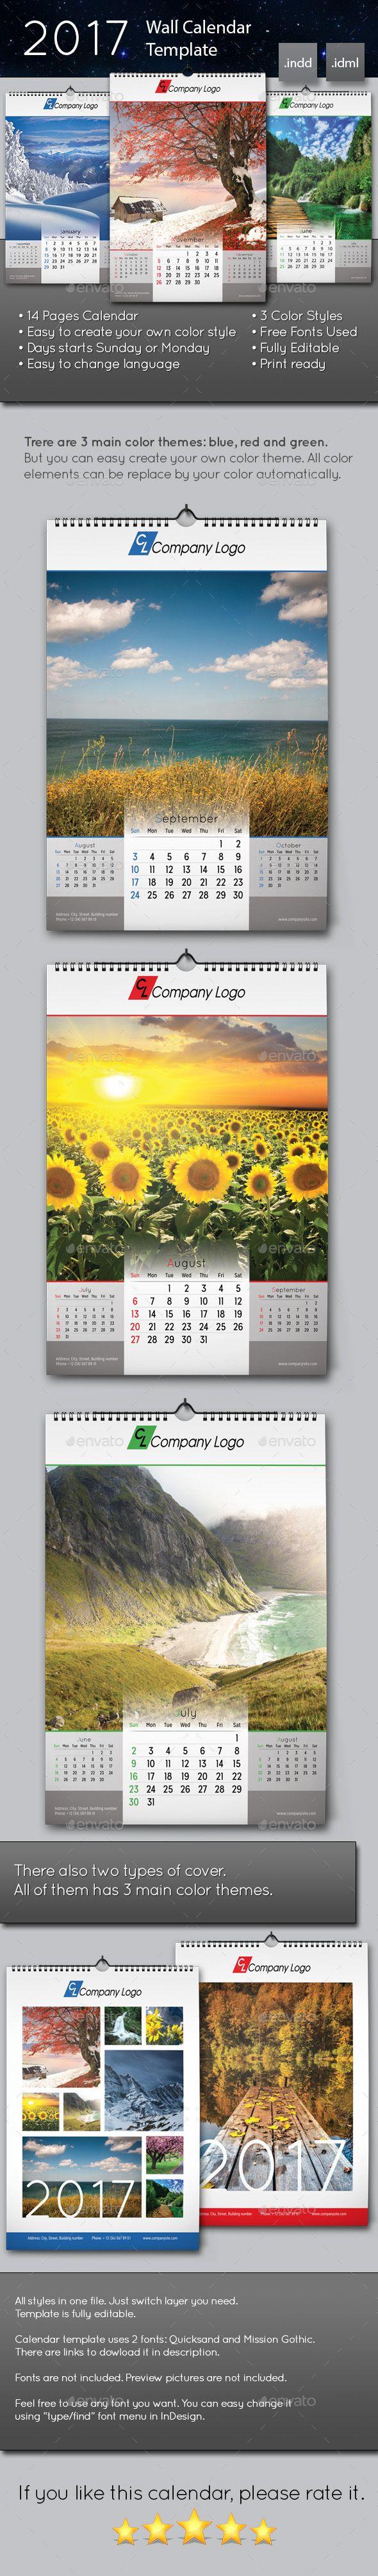 1000 ideas about calendar templates on pinterest printable calendar template printable. Black Bedroom Furniture Sets. Home Design Ideas